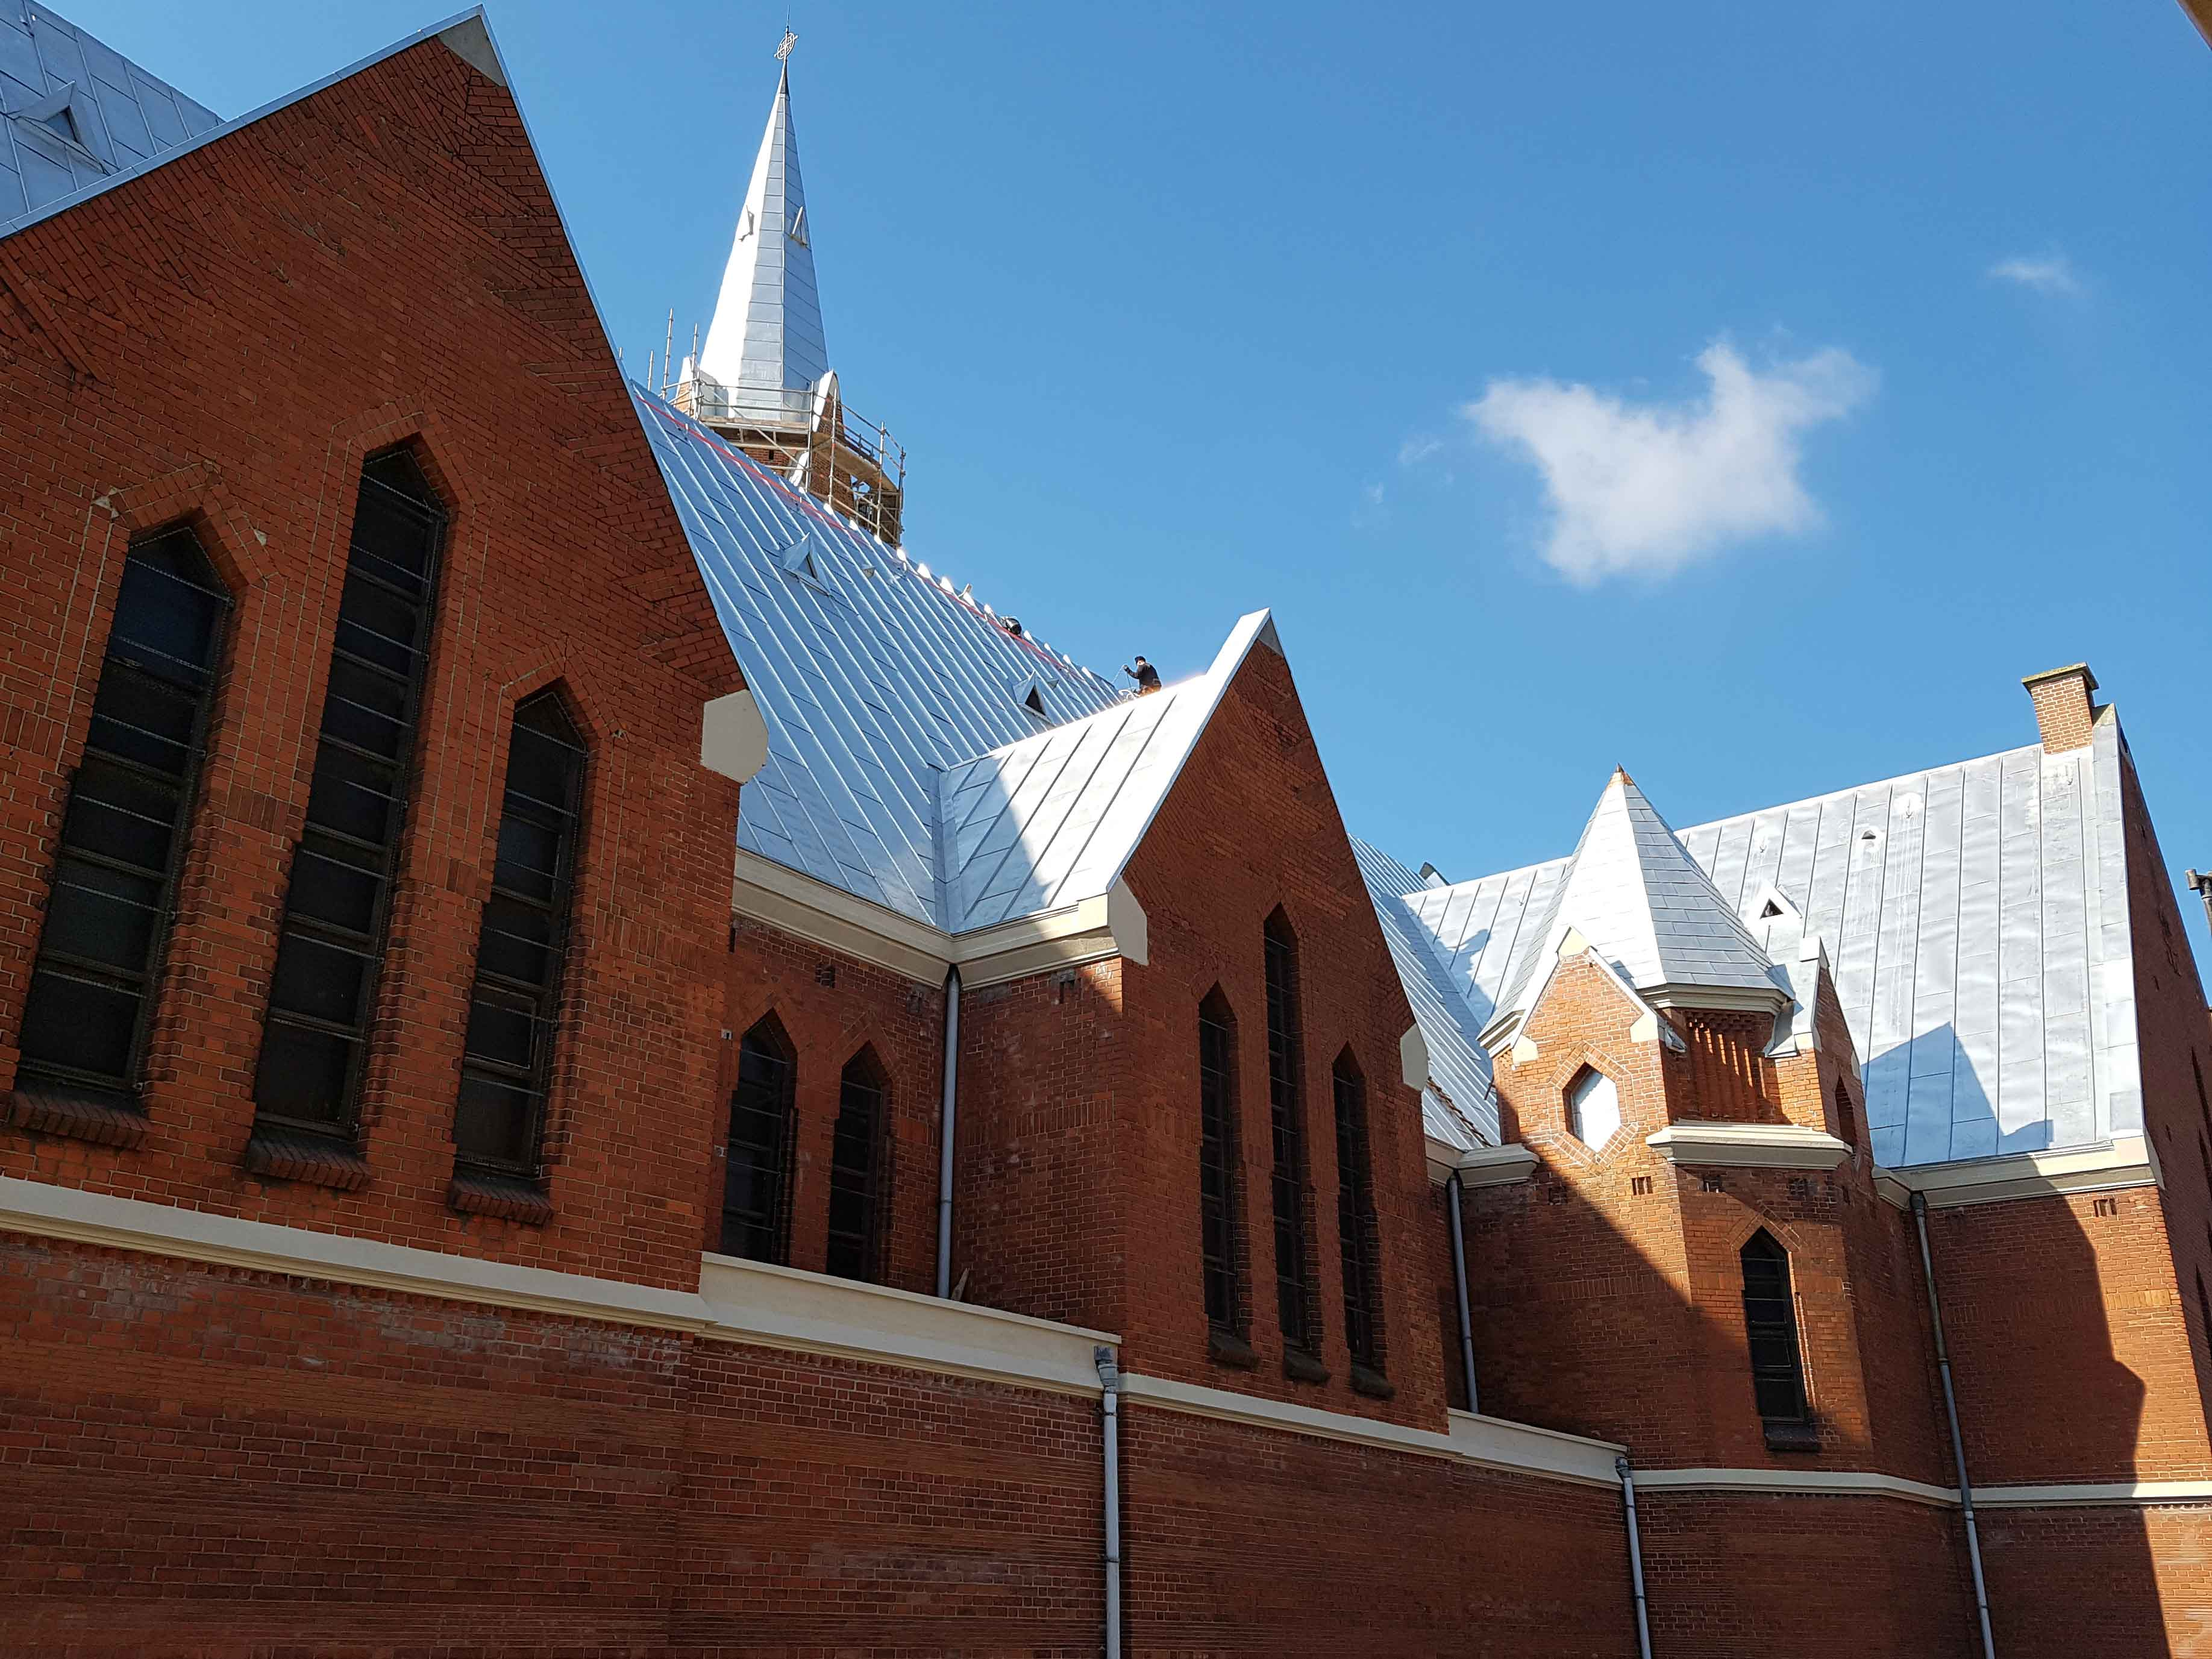 Eglise du Coeur Immaculé 13